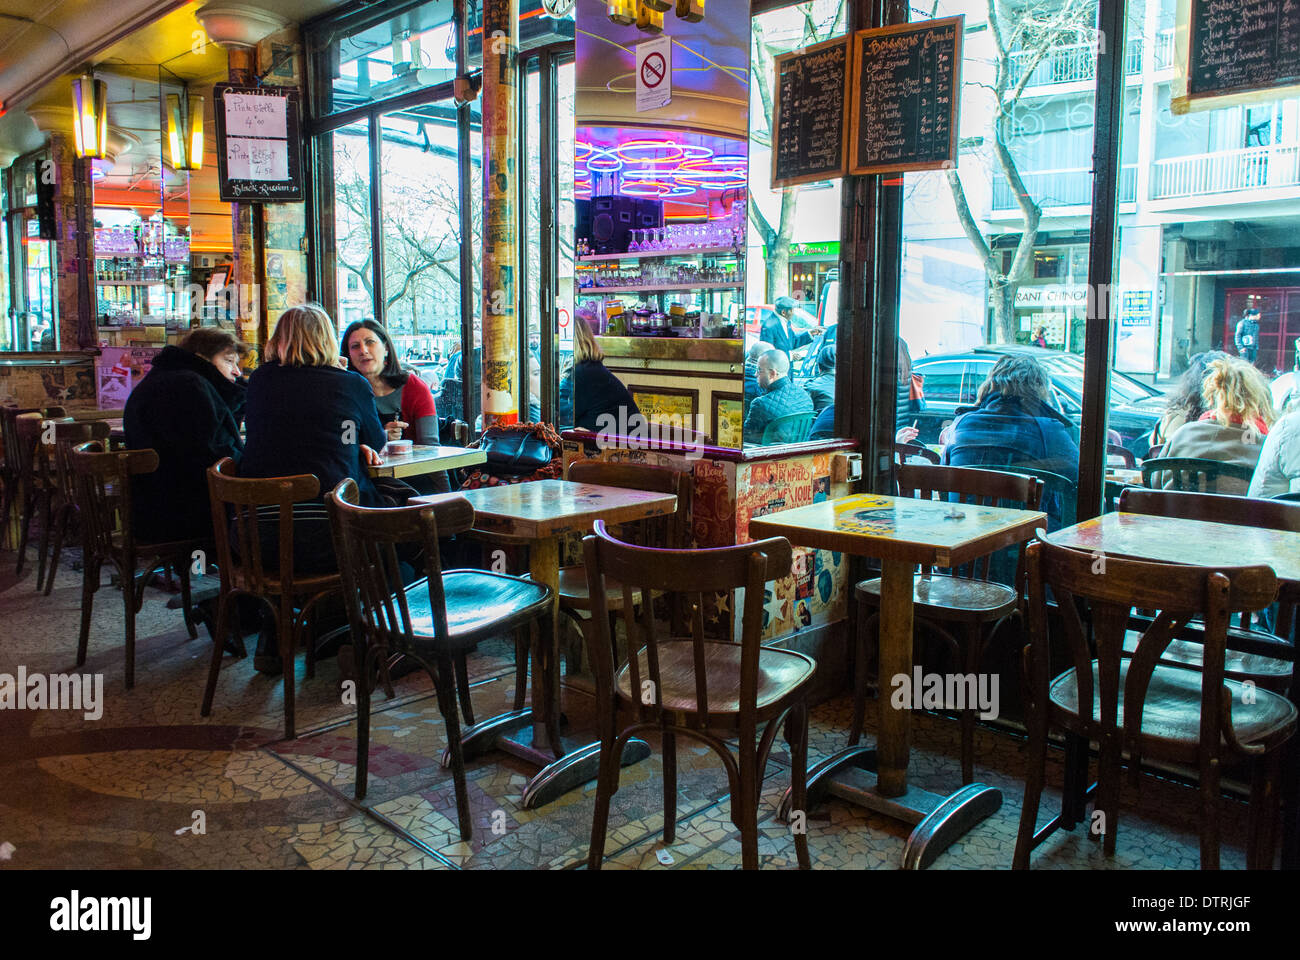 Paris cafe france people inside vintage french caf bar for Inside in french